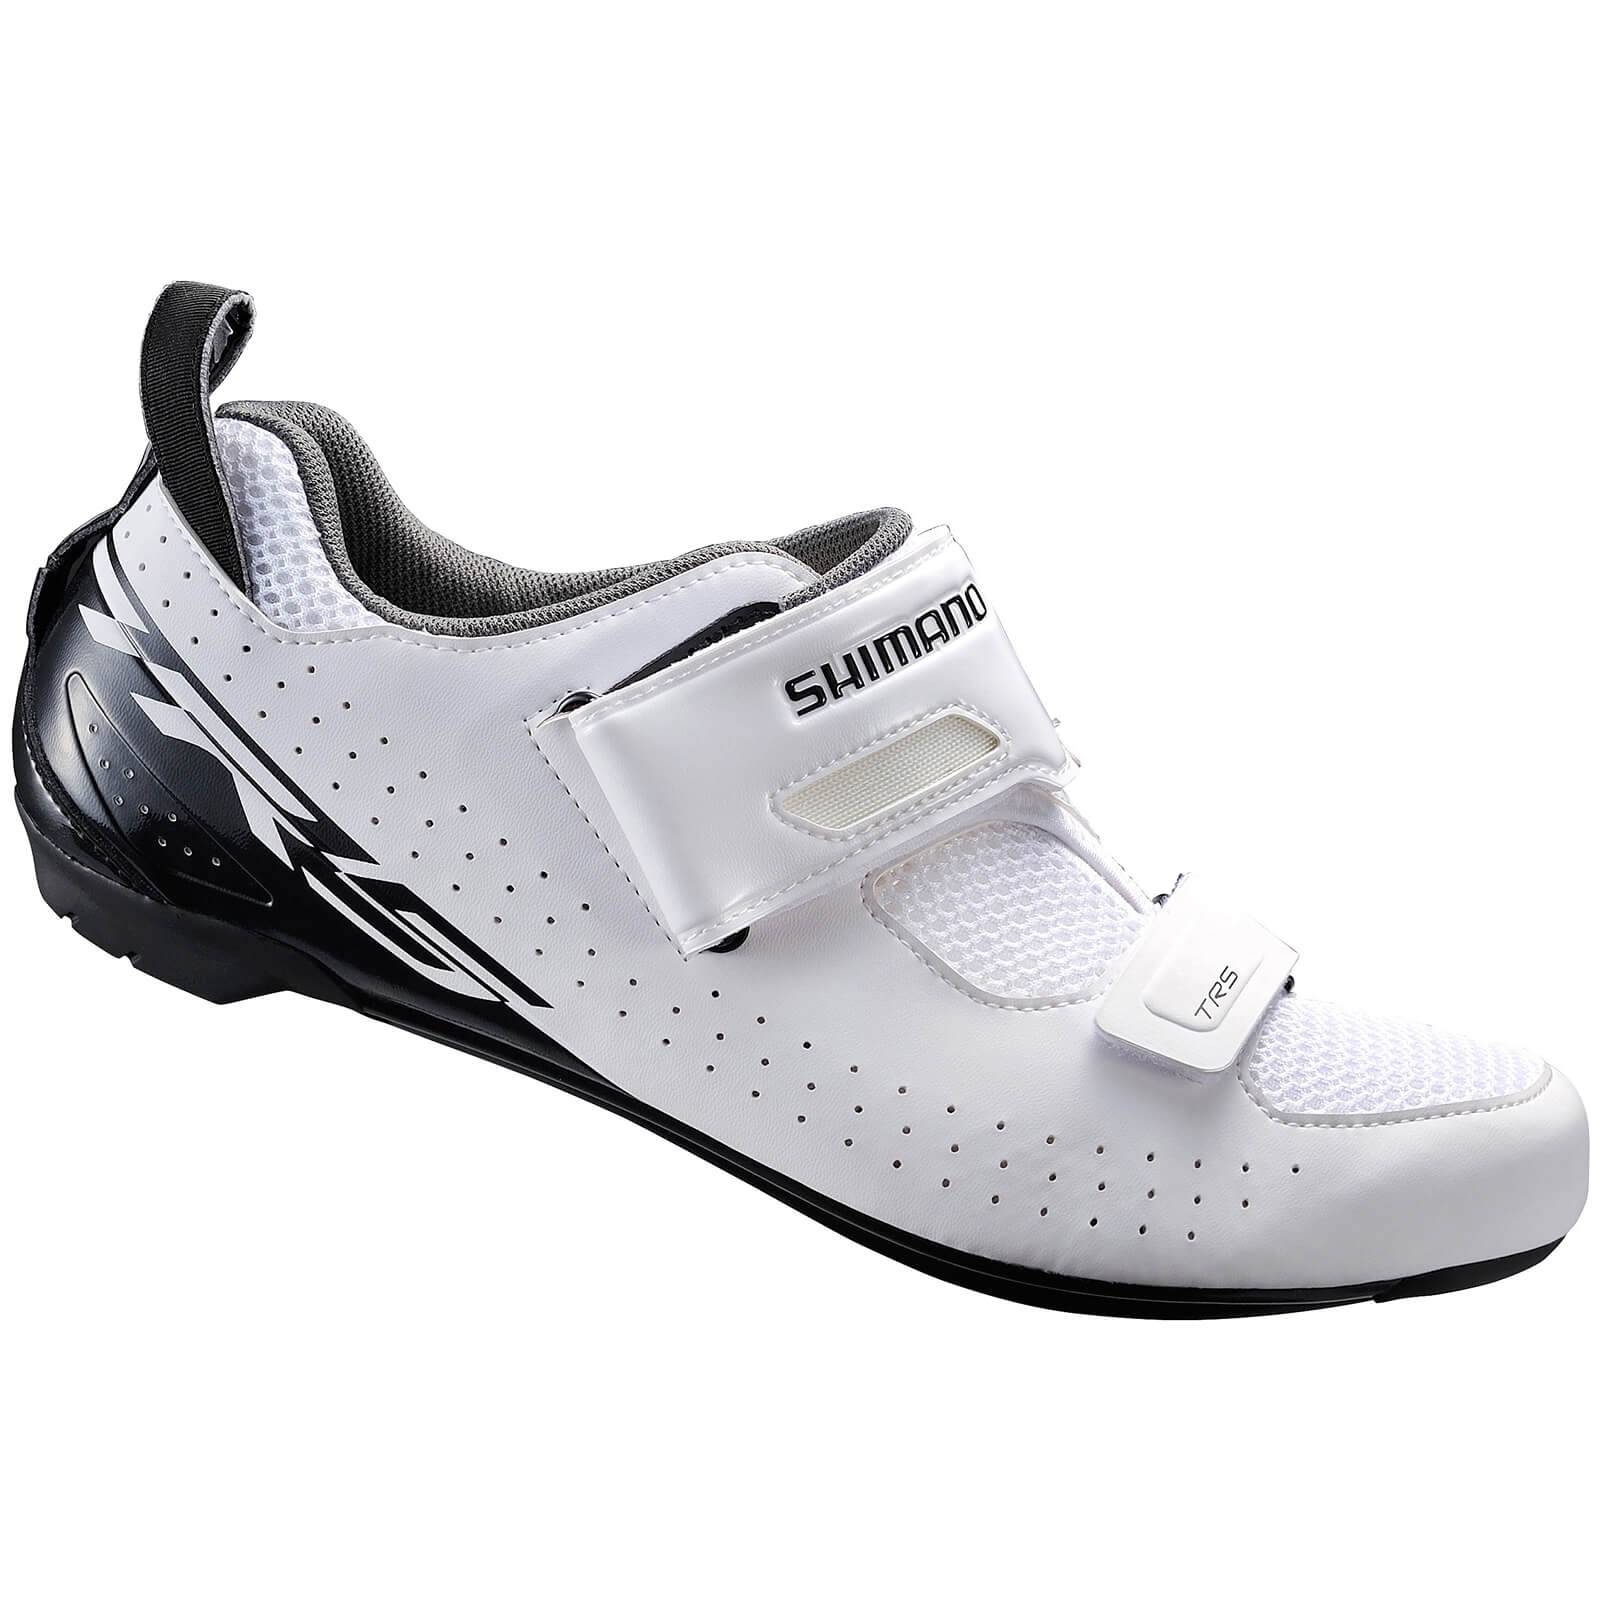 Shimano TR5 SPD-SL Triathlon Shoes - White - EU 46 - White